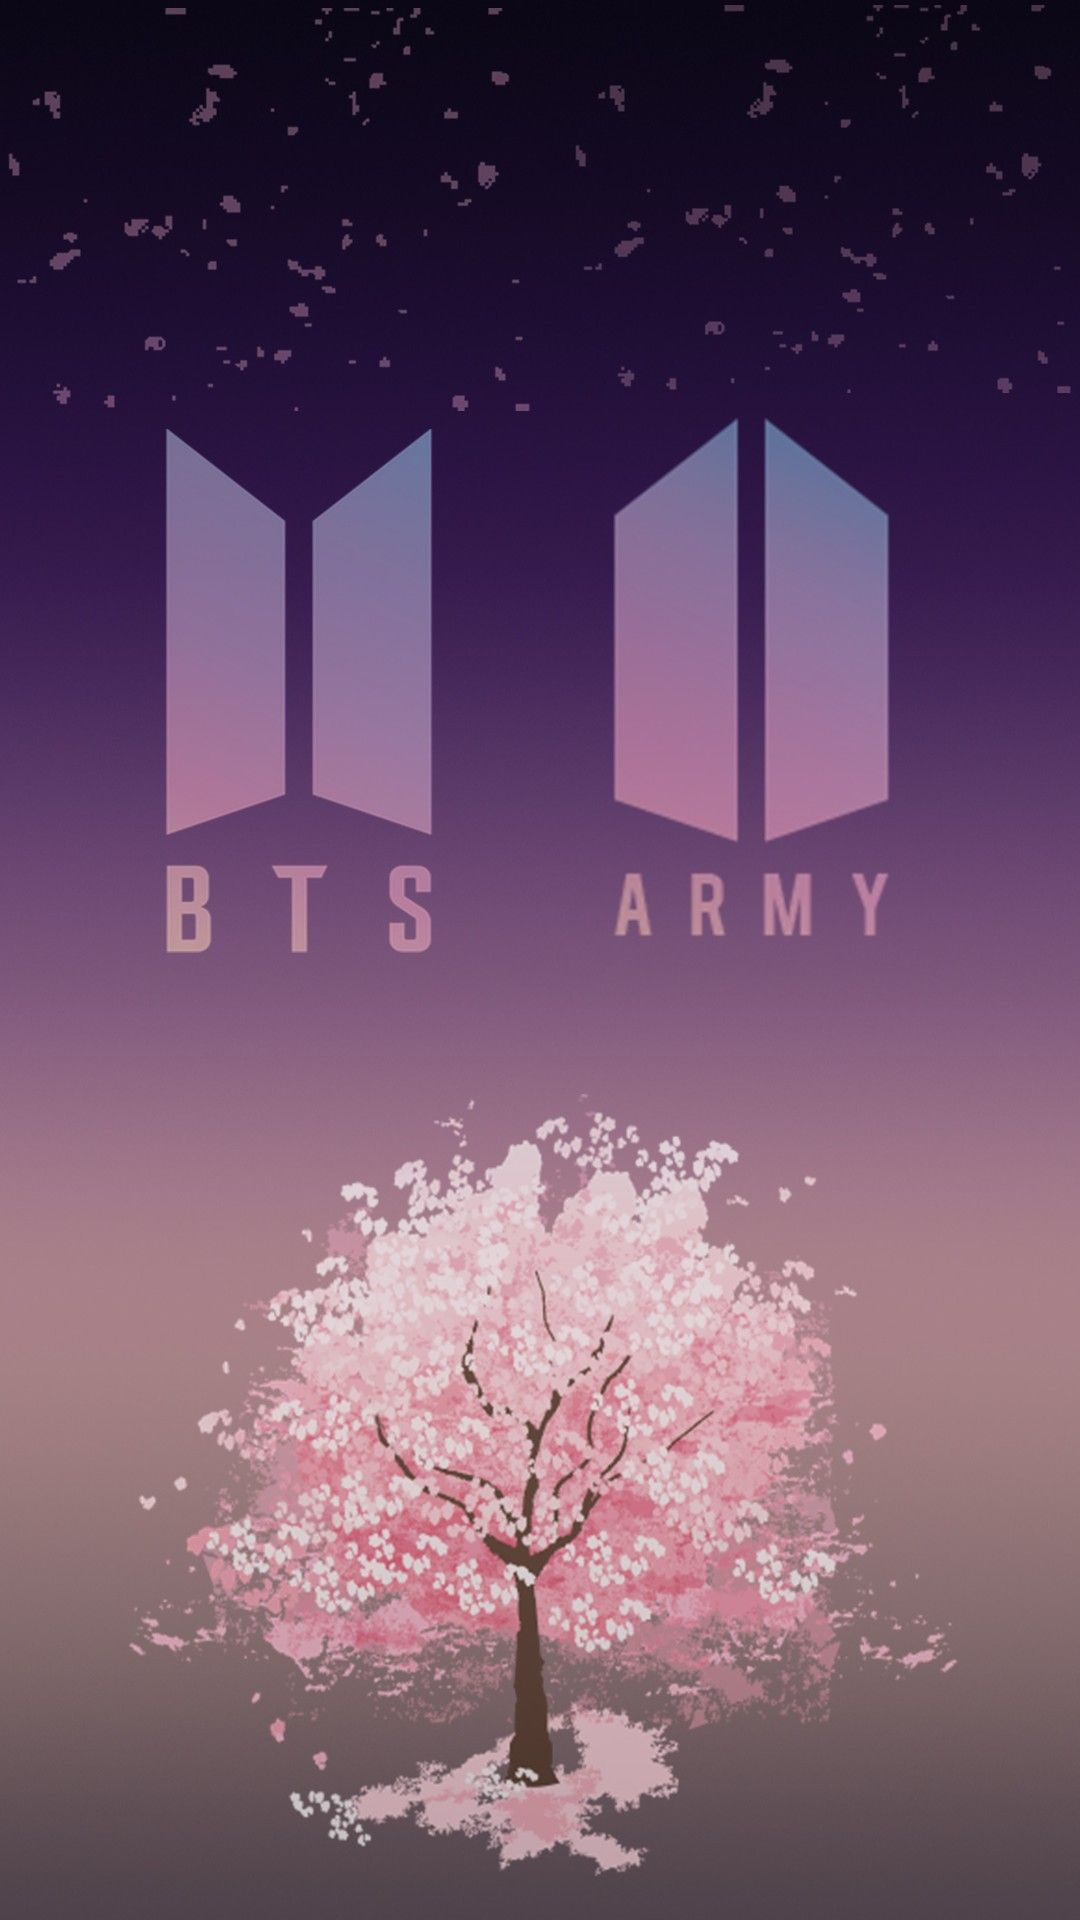 BTS ARMY bts army fandom bantang bantangboys